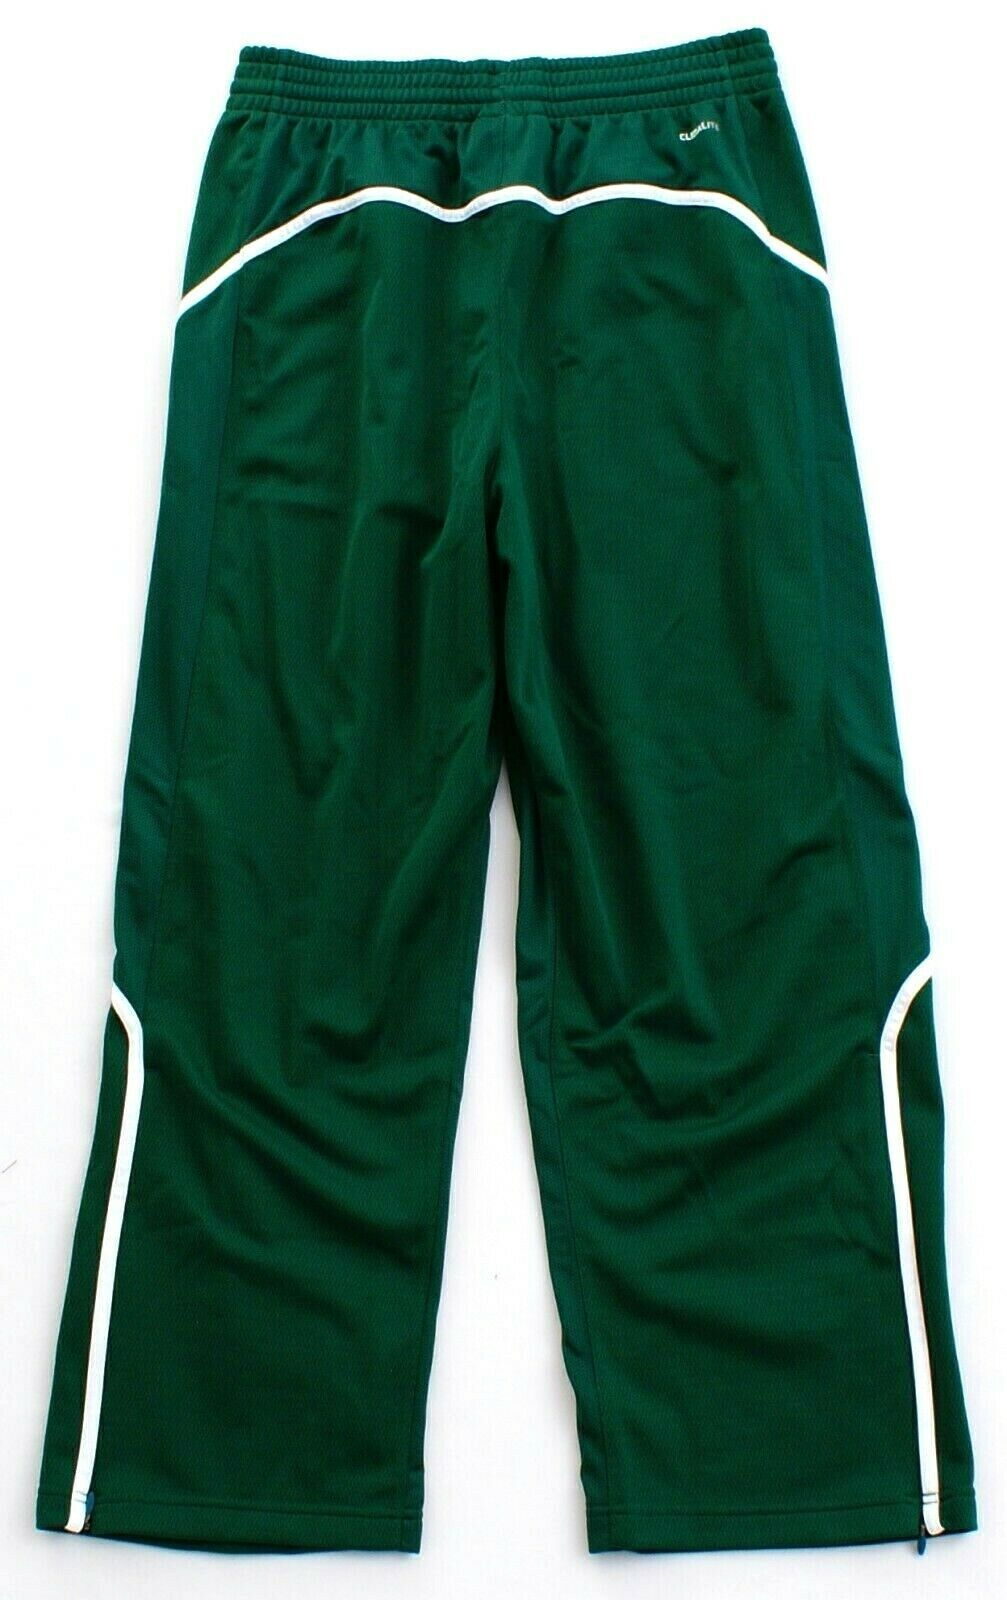 Adidas ClimaLite Green & White Pro Team Track Pants Men's NWT